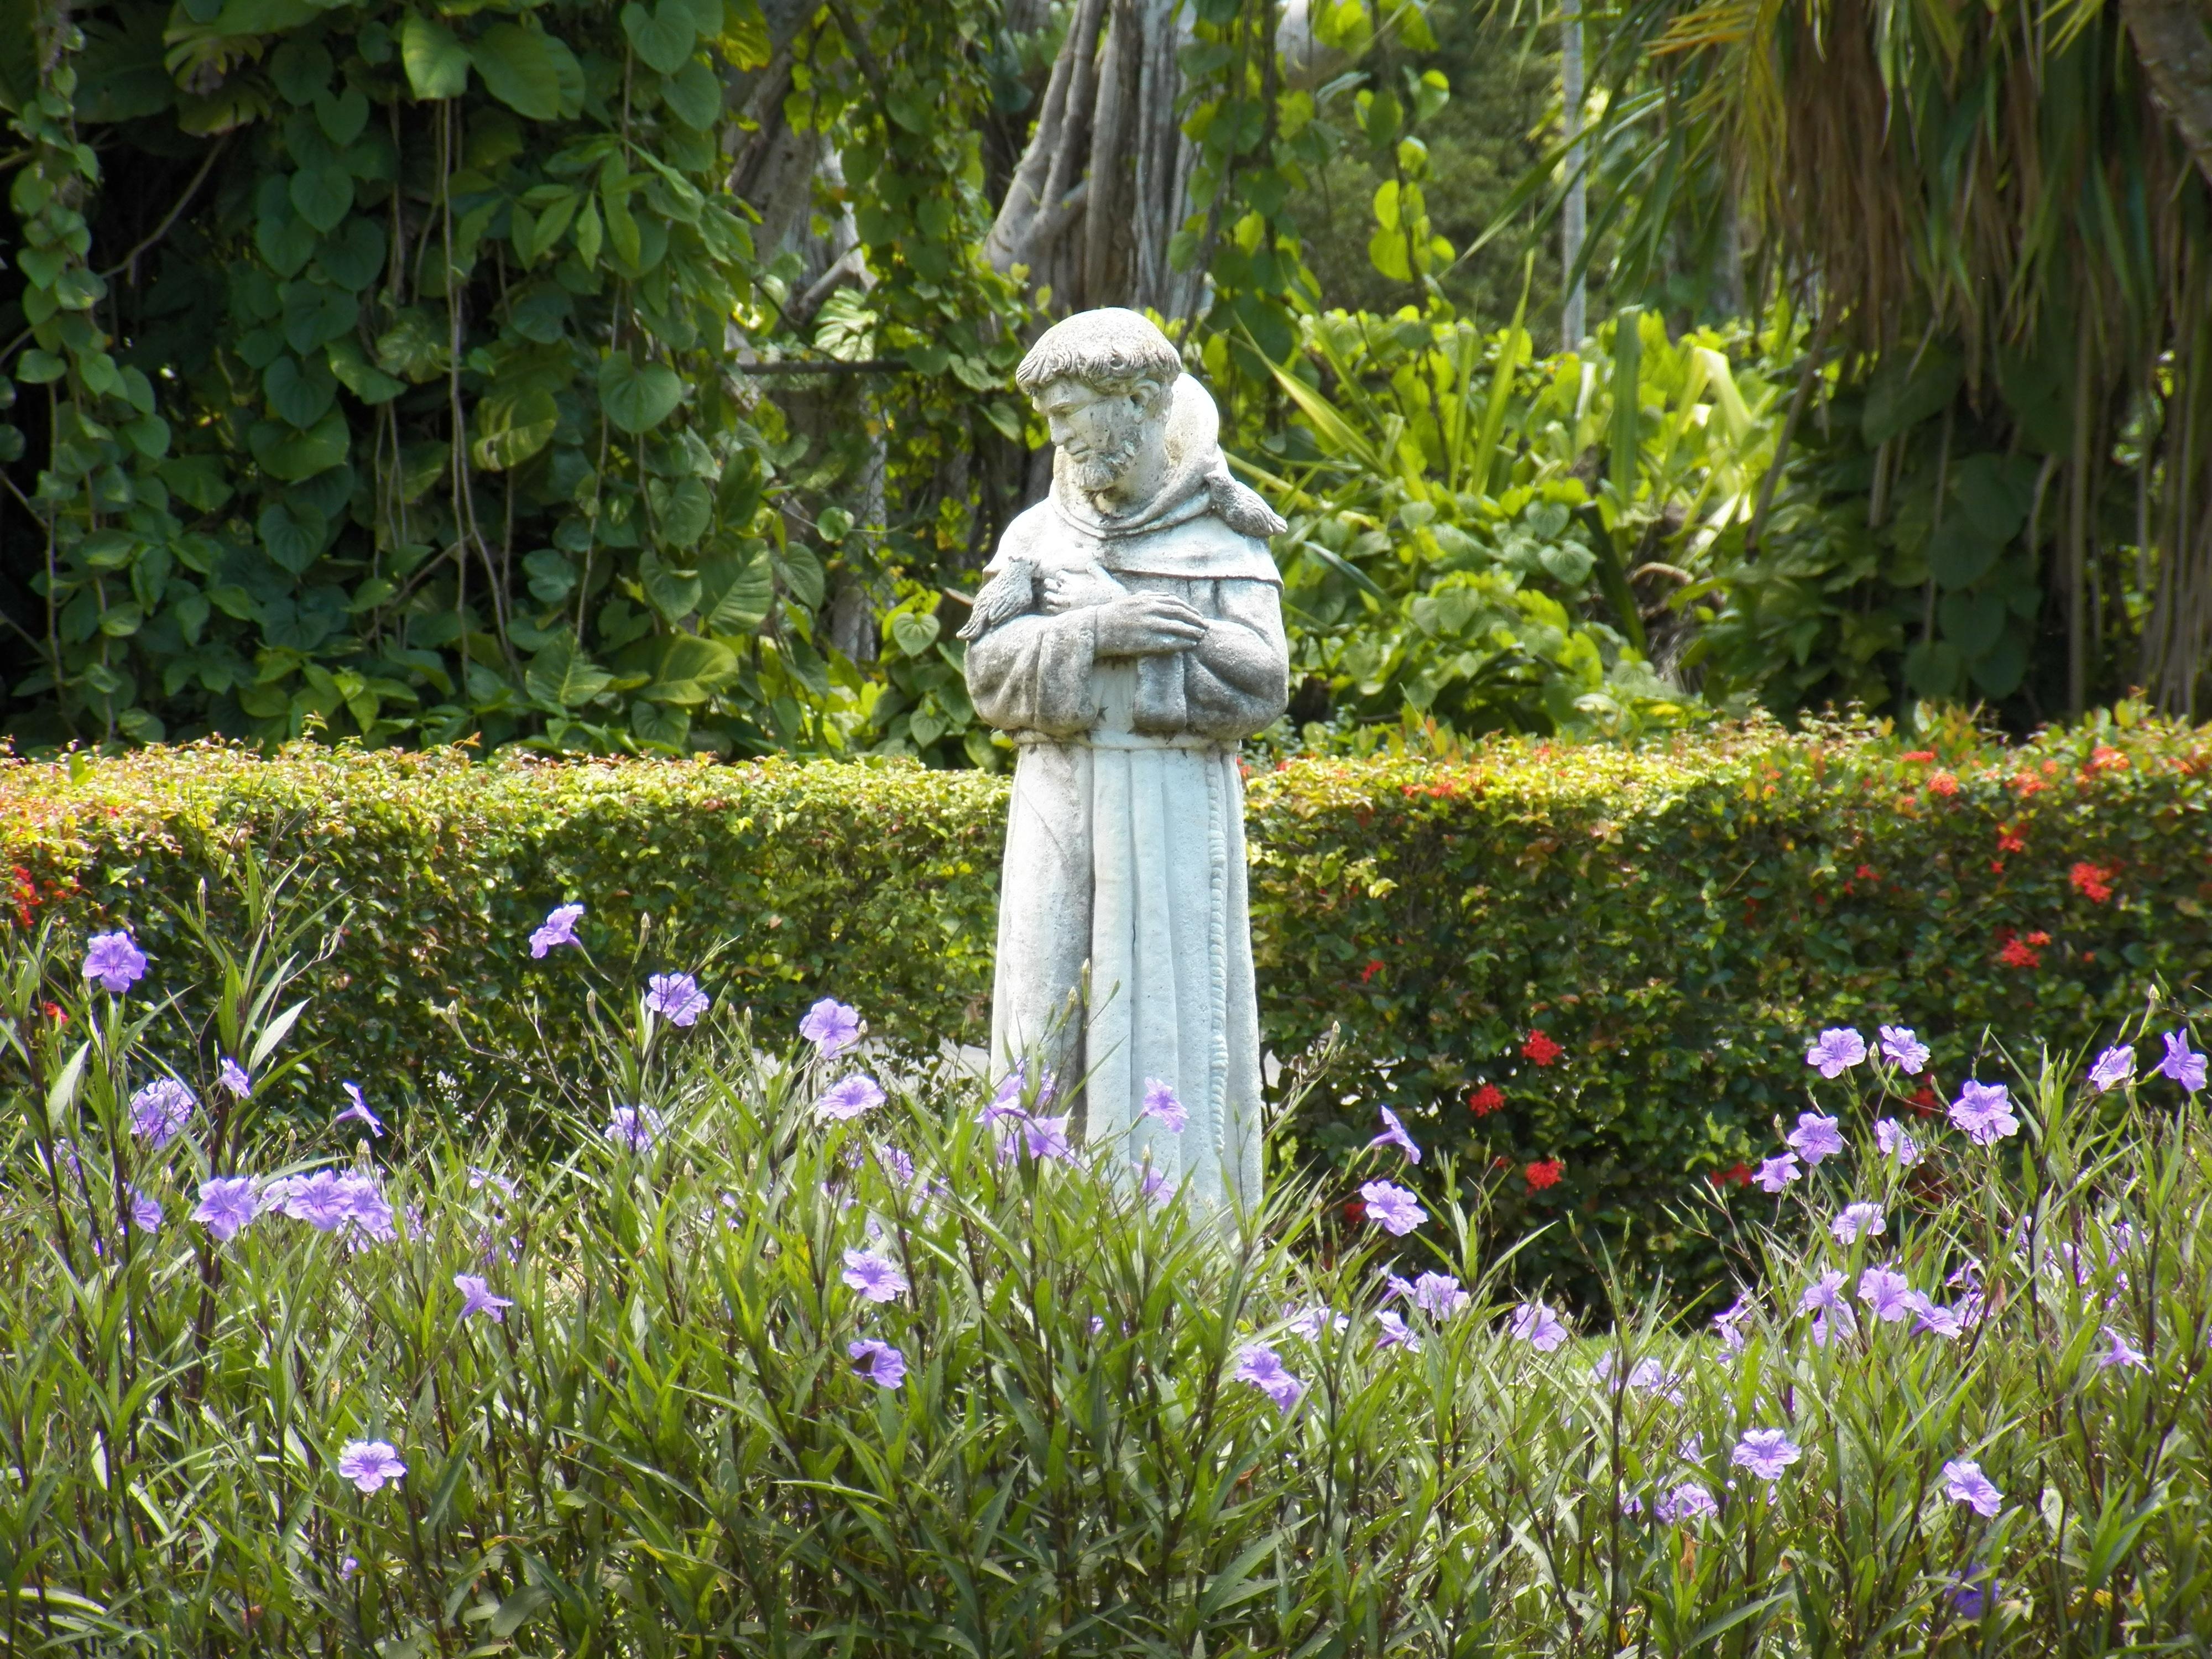 Grass Plant Lawn Meadow Flower Monument Statue Park Botany Garden Christian  Flora Wildflower Religious Botanical Garden